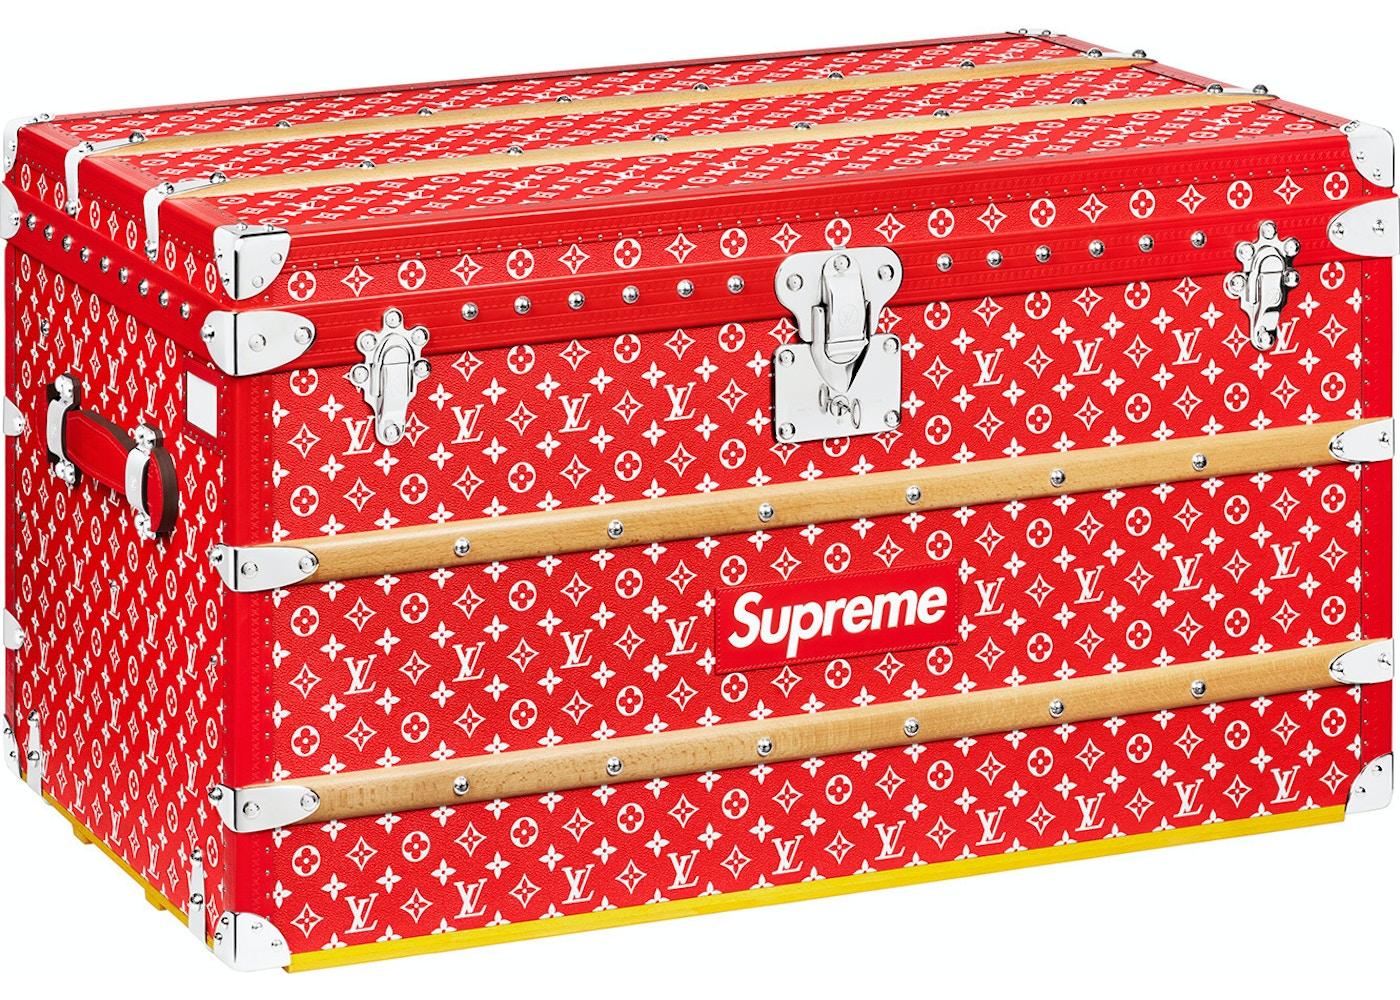 louis vuitton x supreme malle courrier trunk monogram 90 red. Black Bedroom Furniture Sets. Home Design Ideas